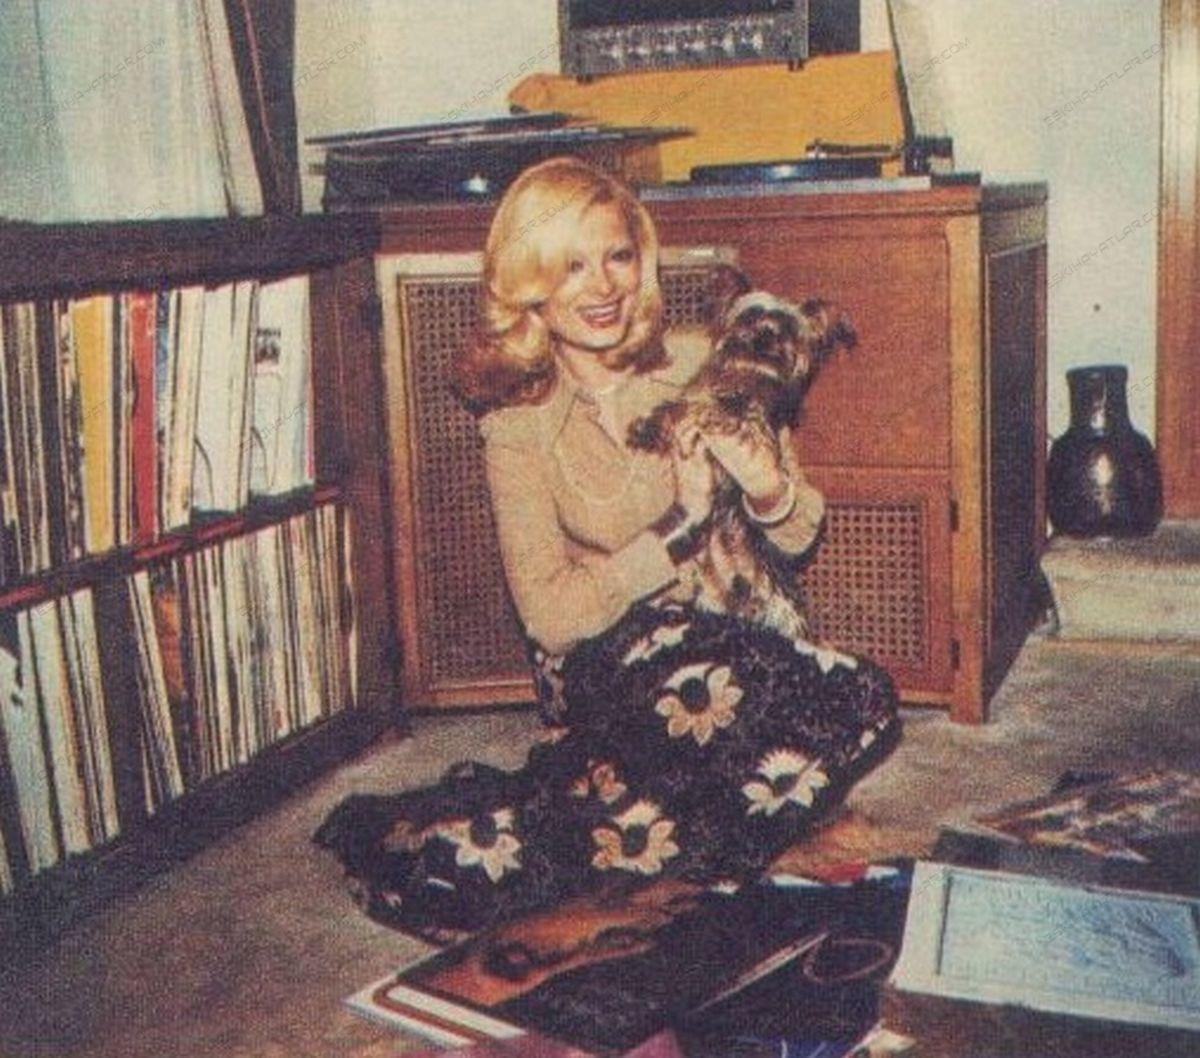 0074-yetmisli-yillarda-muzik-sistemleri-1974-hayat-dergisi-pikap-fotograflari-plak-gorselleri (2)